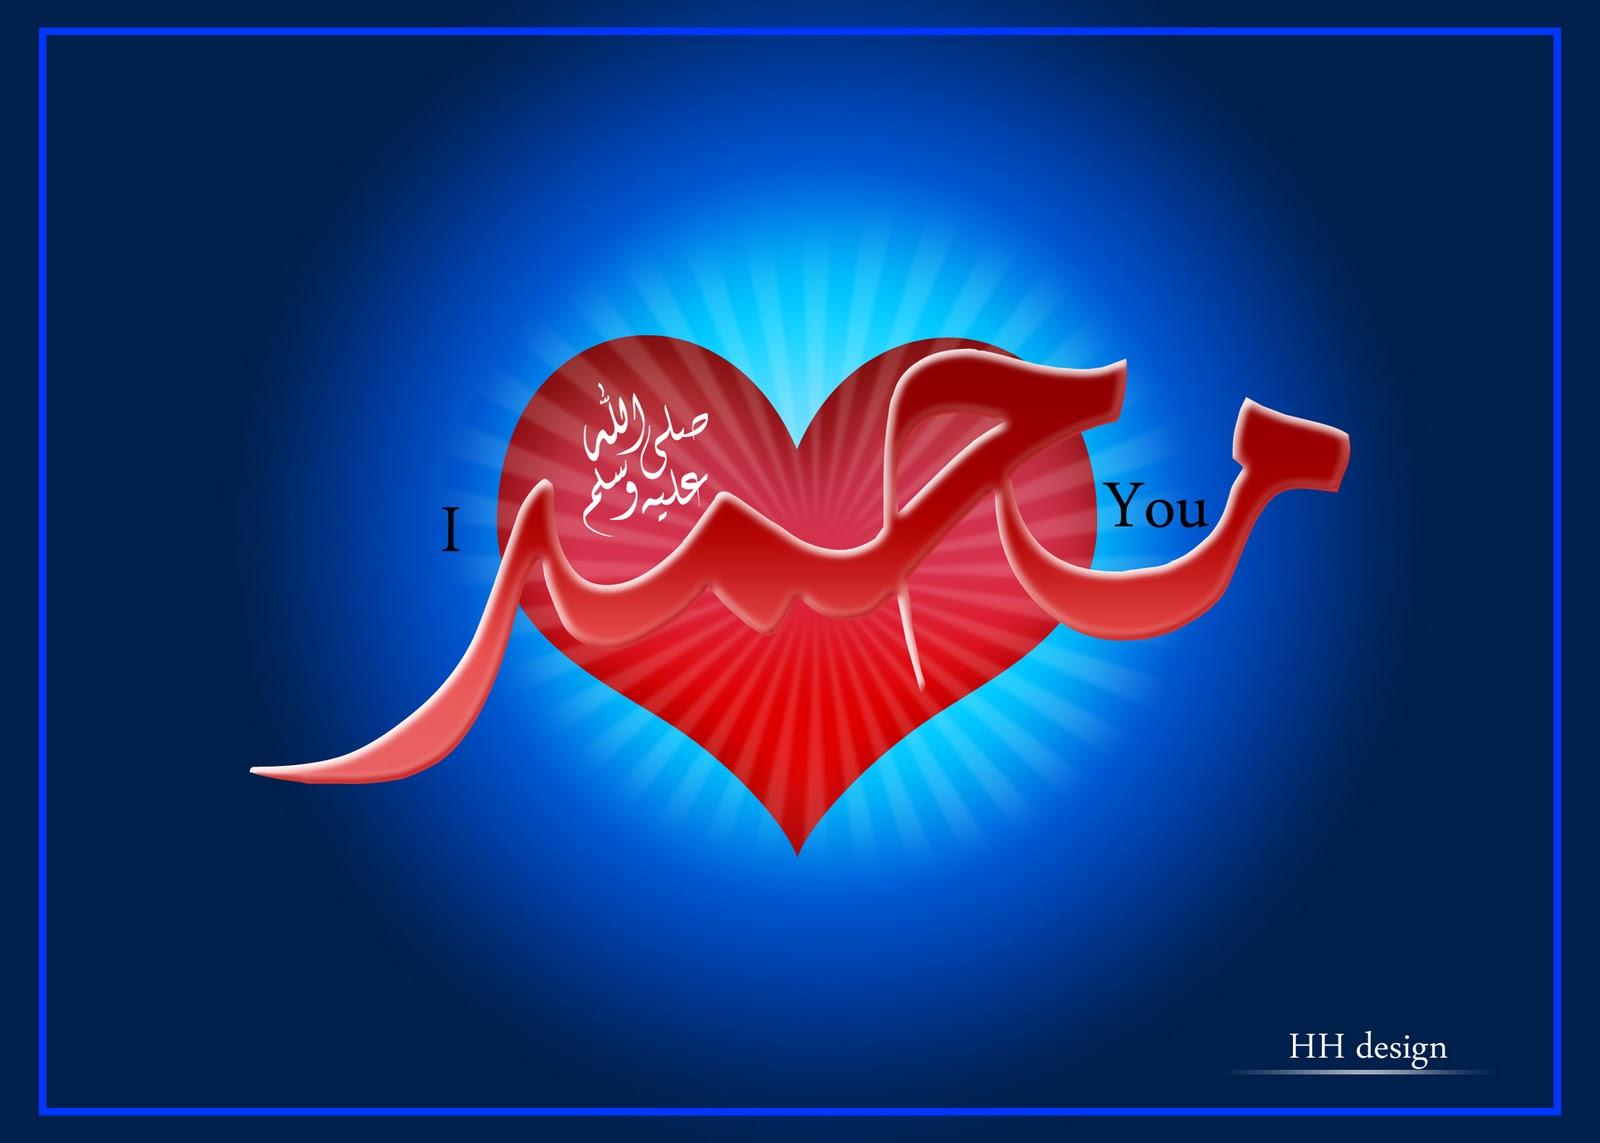 http://1.bp.blogspot.com/-sBAkwn6M7ic/TZ2ld8lxLKI/AAAAAAAAABE/1AufpnUvN0w/s1600/Muhammad+SAW+copy.JPG